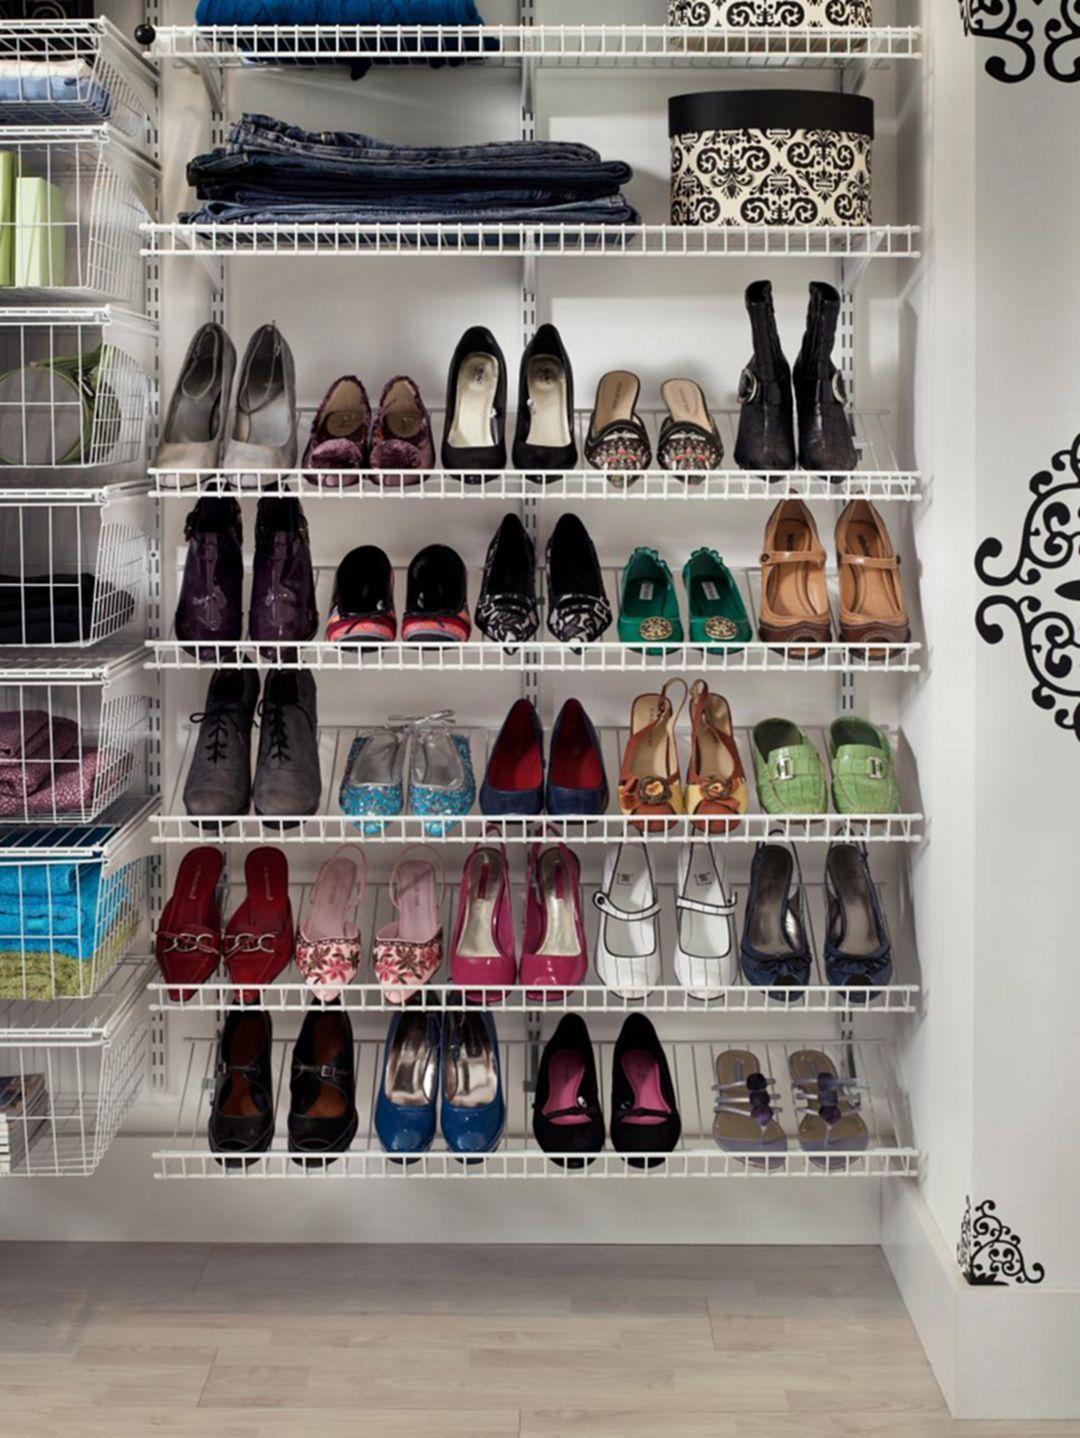 the best 20 creative shoe storage ideas on a budget http on top new diy garage storage and organization ideas minimal budget garage make over id=45203